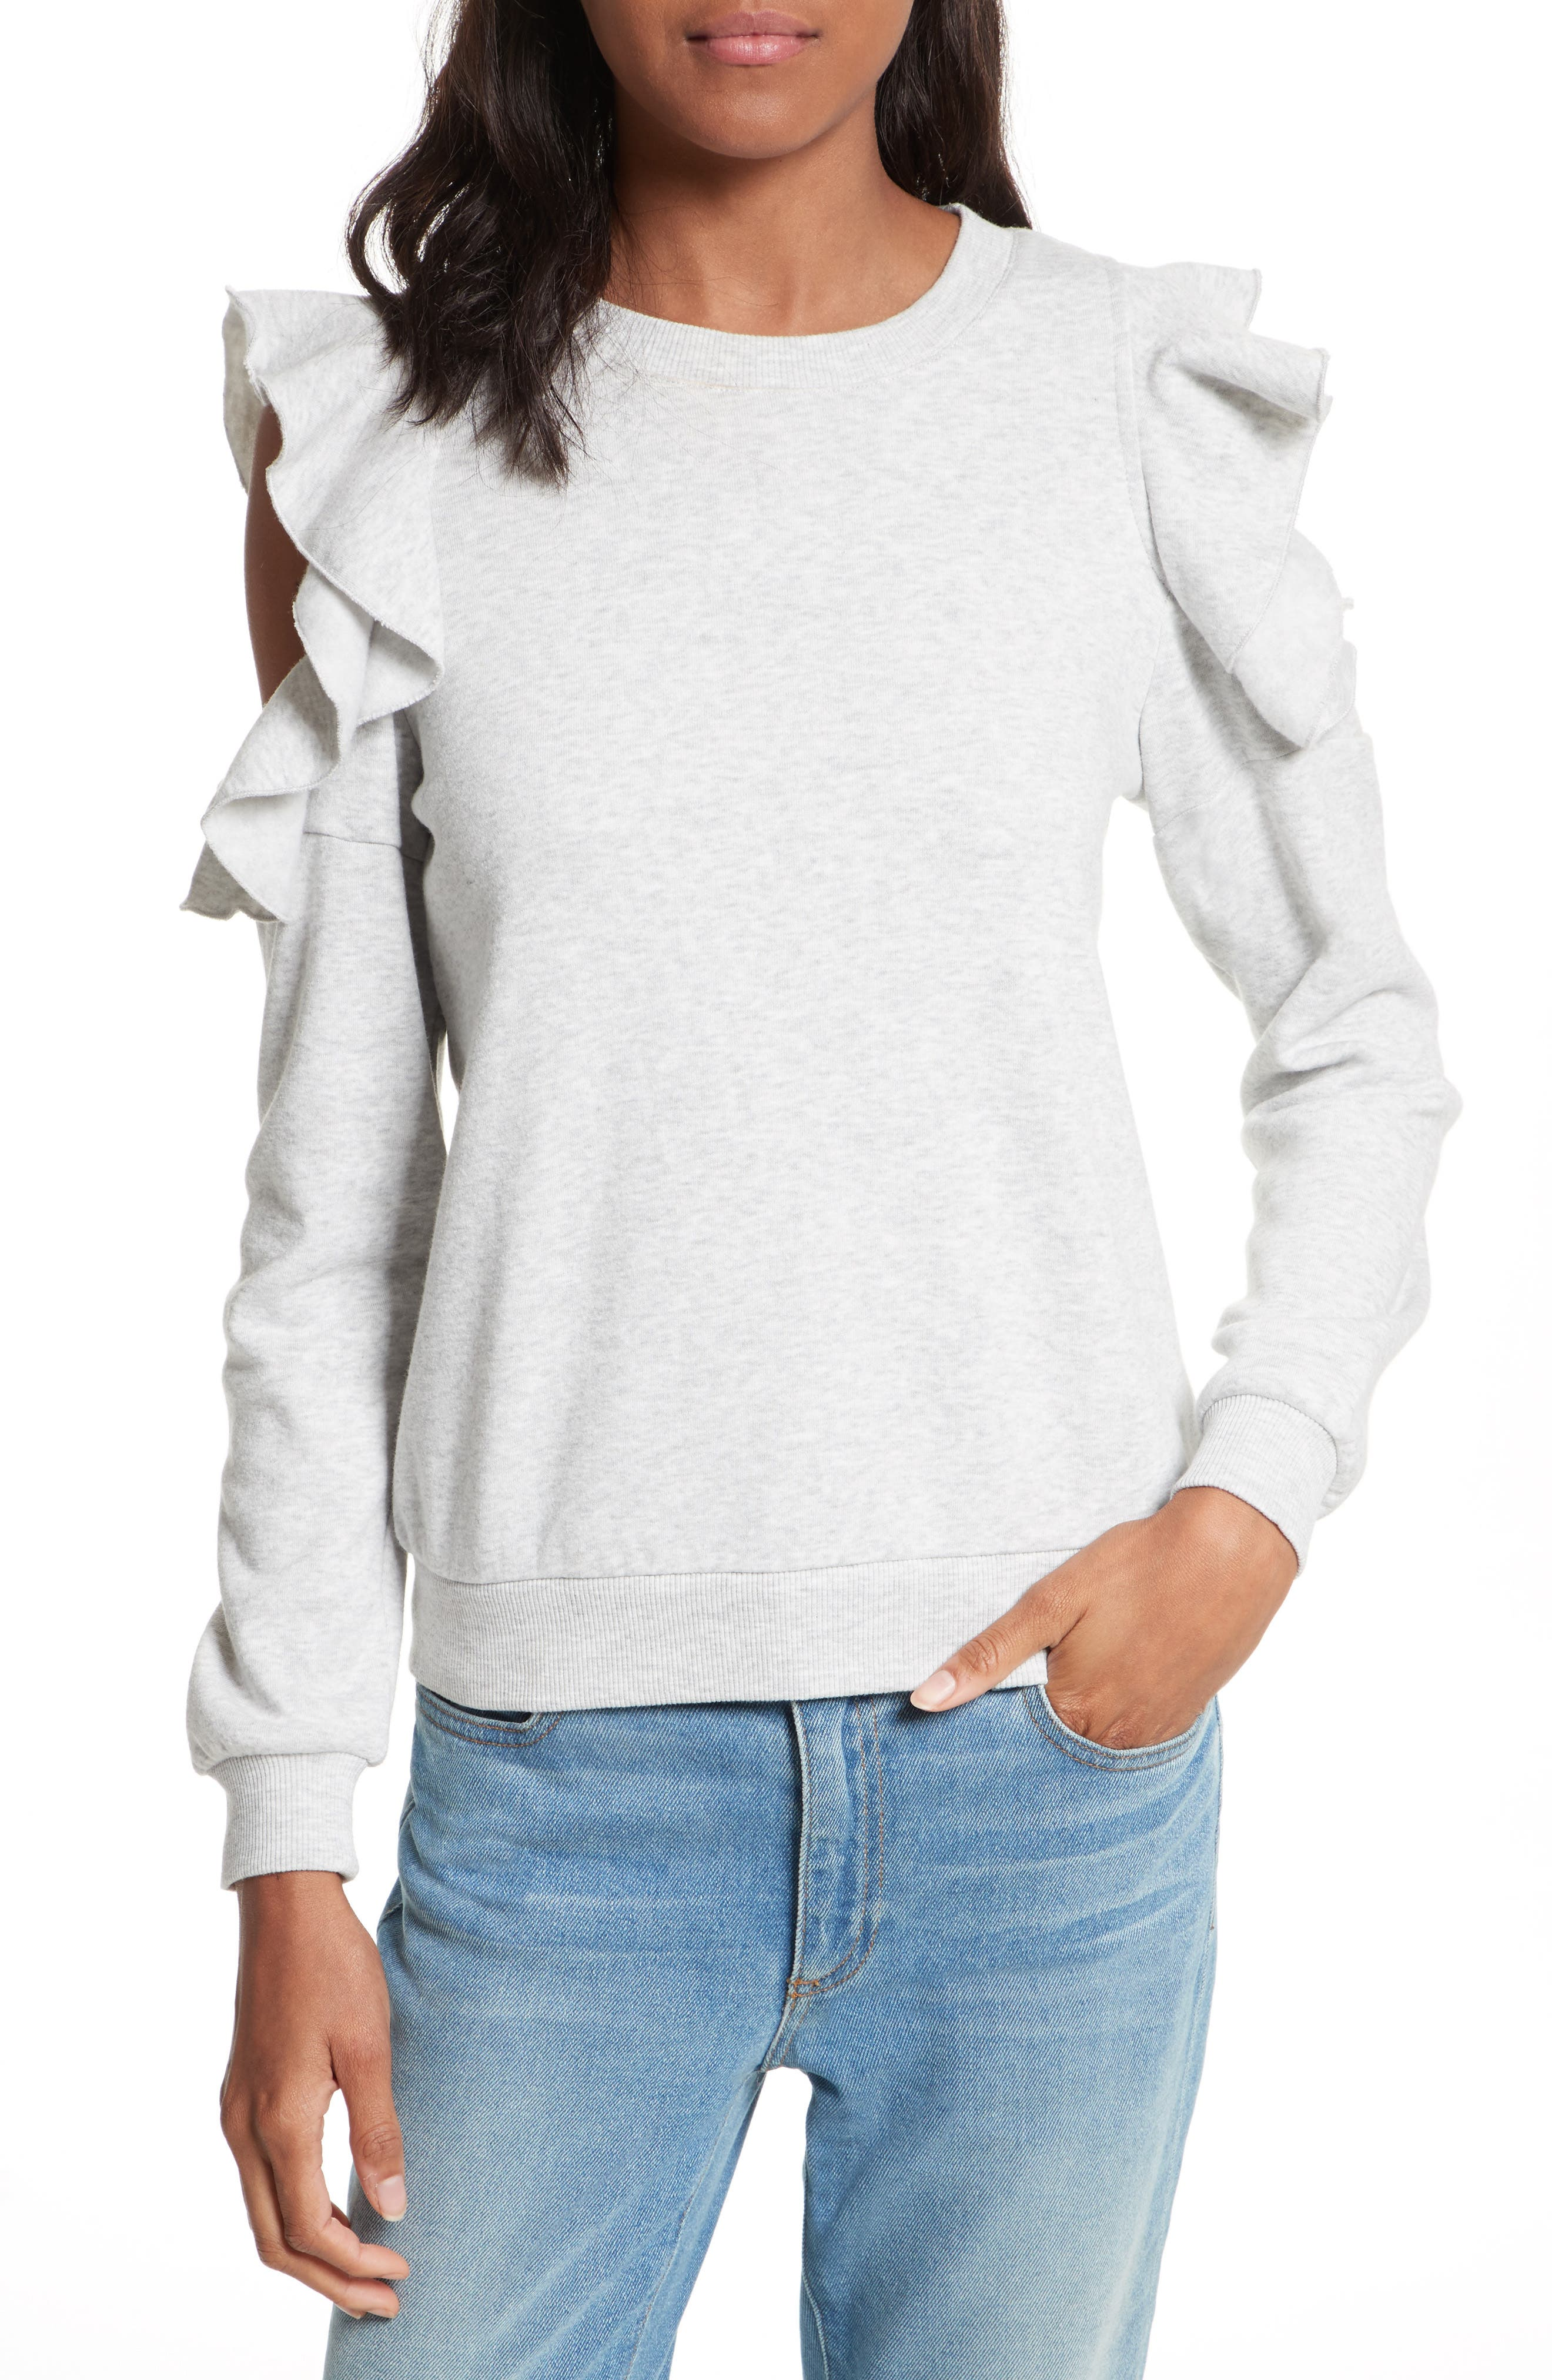 Main Image - Rebecca Minkoff Gracie Cold Shoulder Sweatshirt